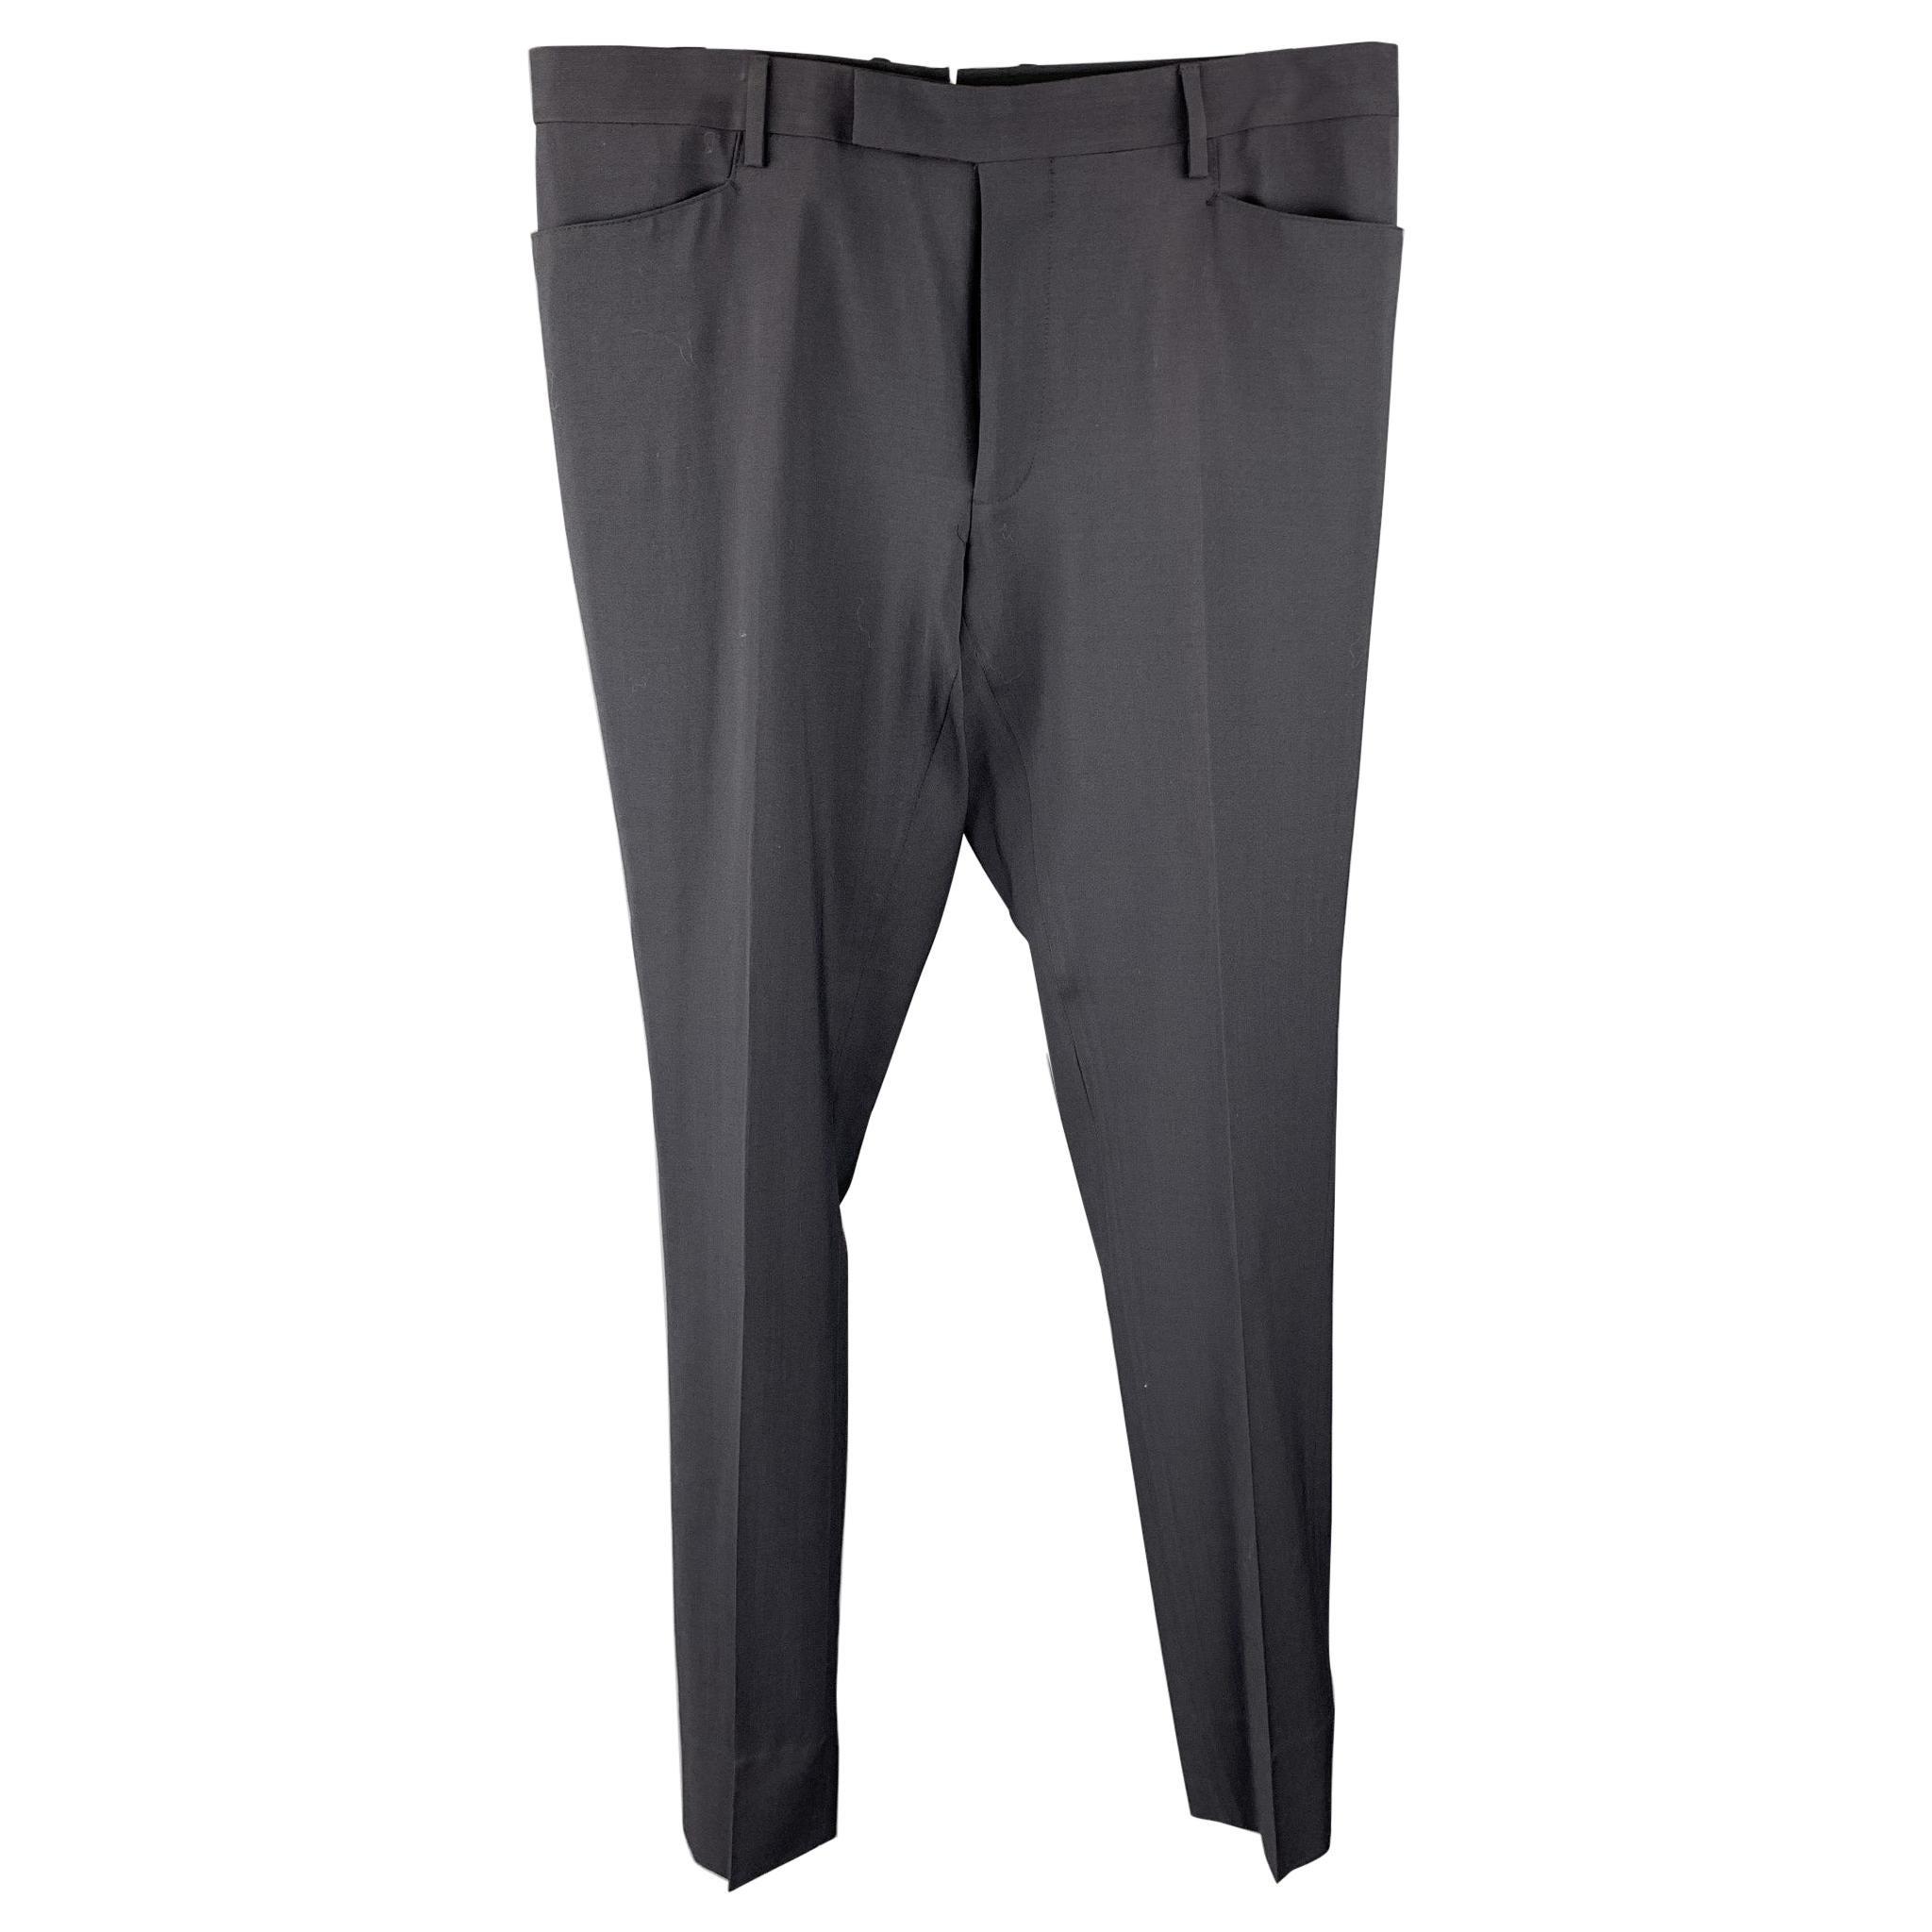 LANVIN Size 34 Black Wool Zip Fly Dress Pants